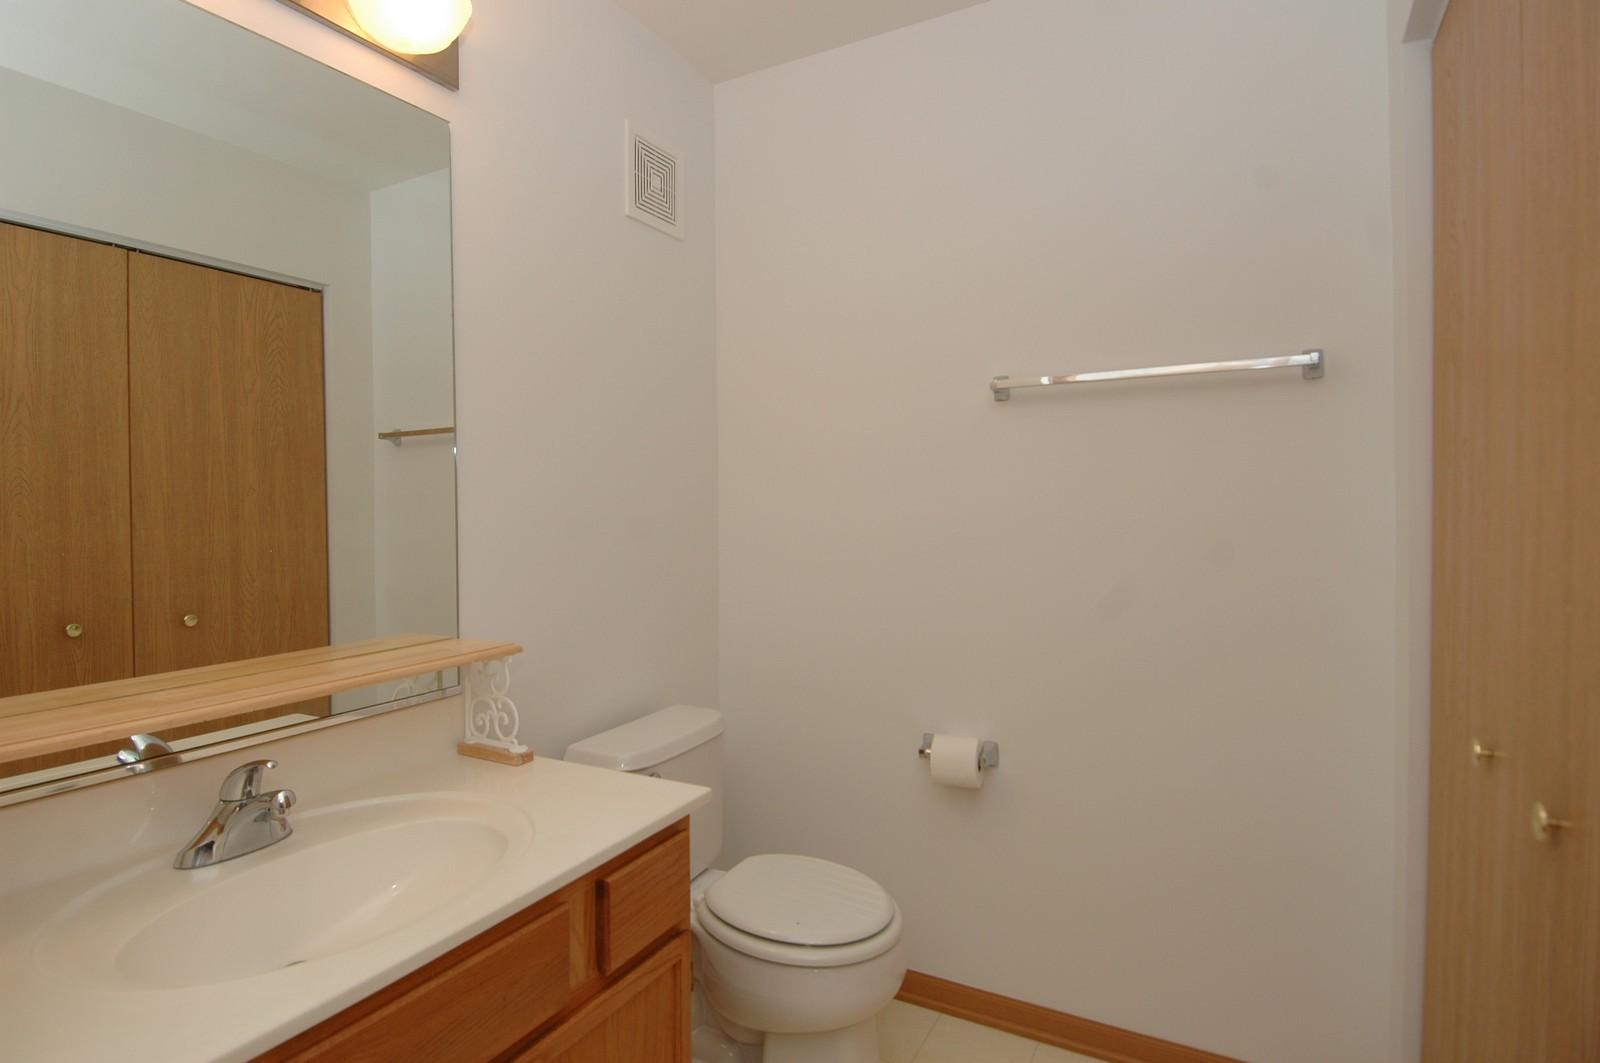 Real Estate Photography - 605 Barrington Ave, Unit 216, East Dundee, IL, 60118 - Bathroom